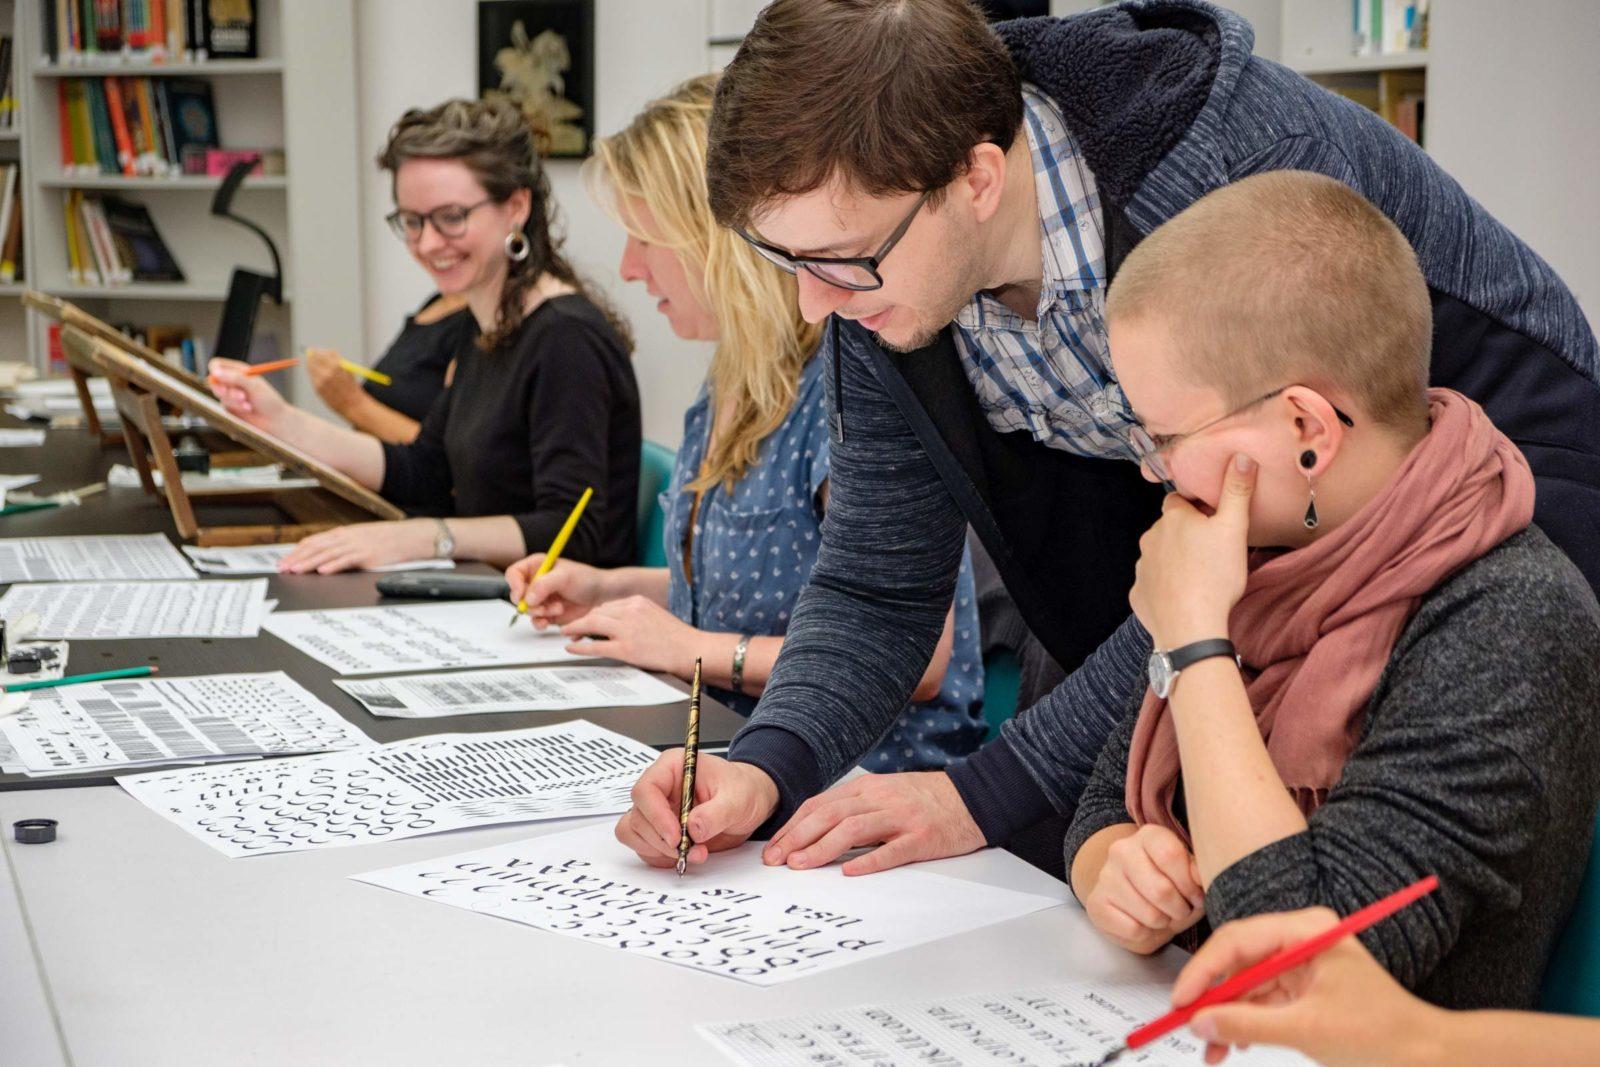 Warschau_2019_Workshop_Calligraphy_IADA_202